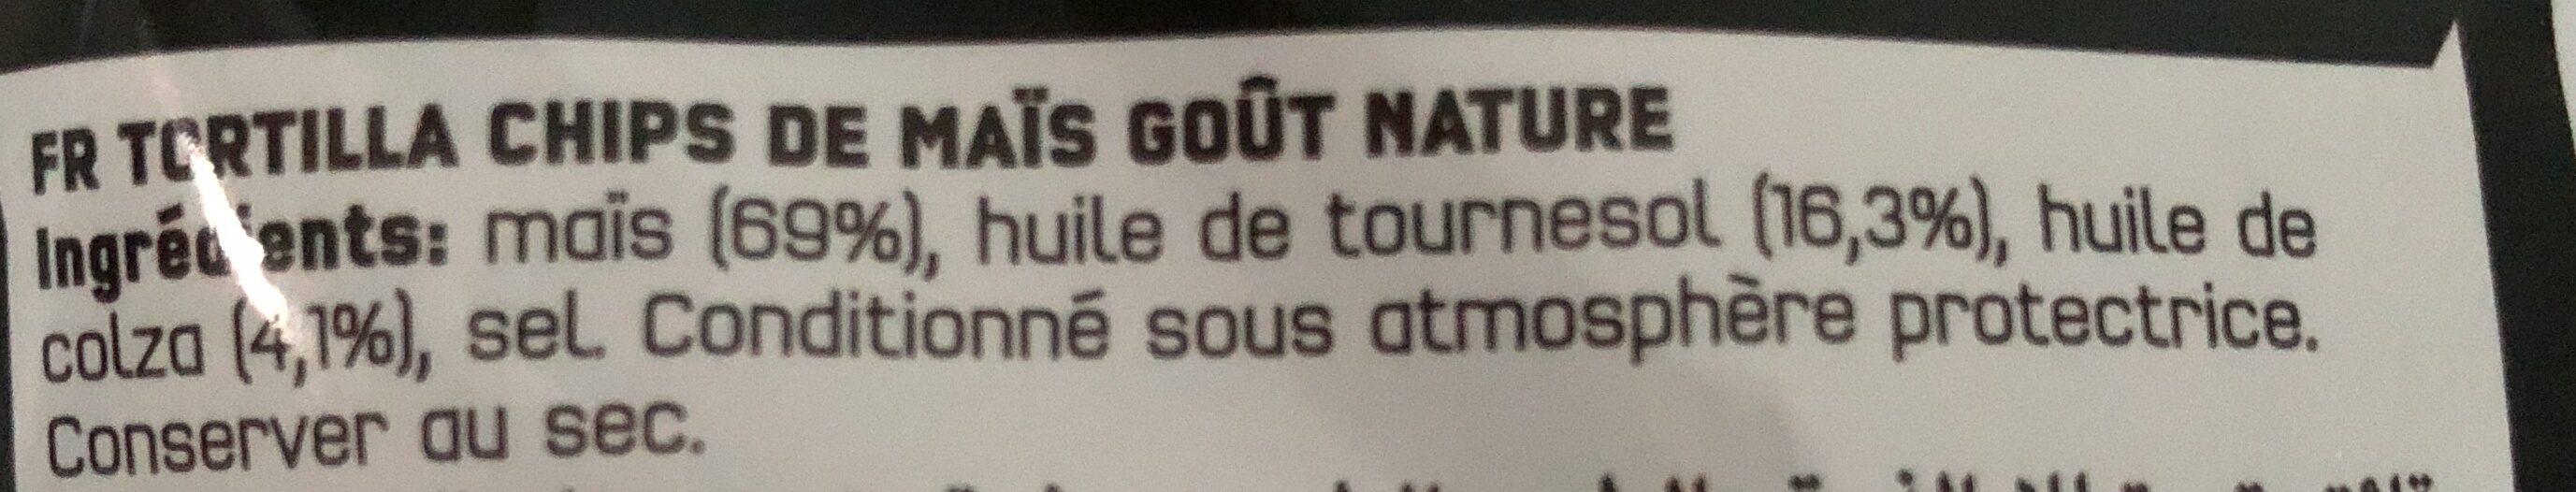 Doritos goût nature - Ingrediënten - fr